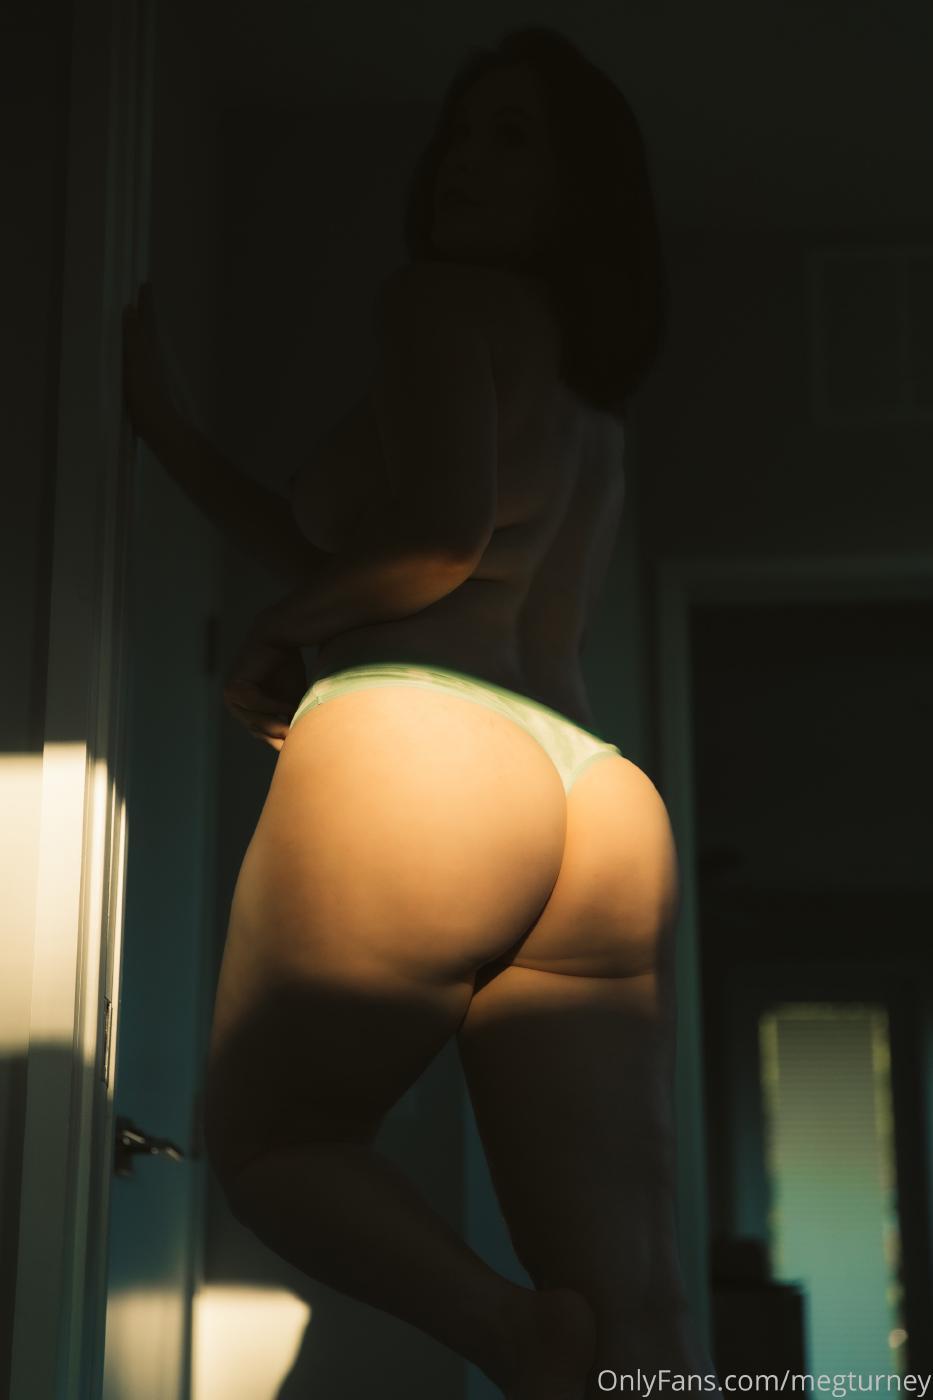 Meg Turney Nude Sunset Onlyfans Set Leaked Ktgemz